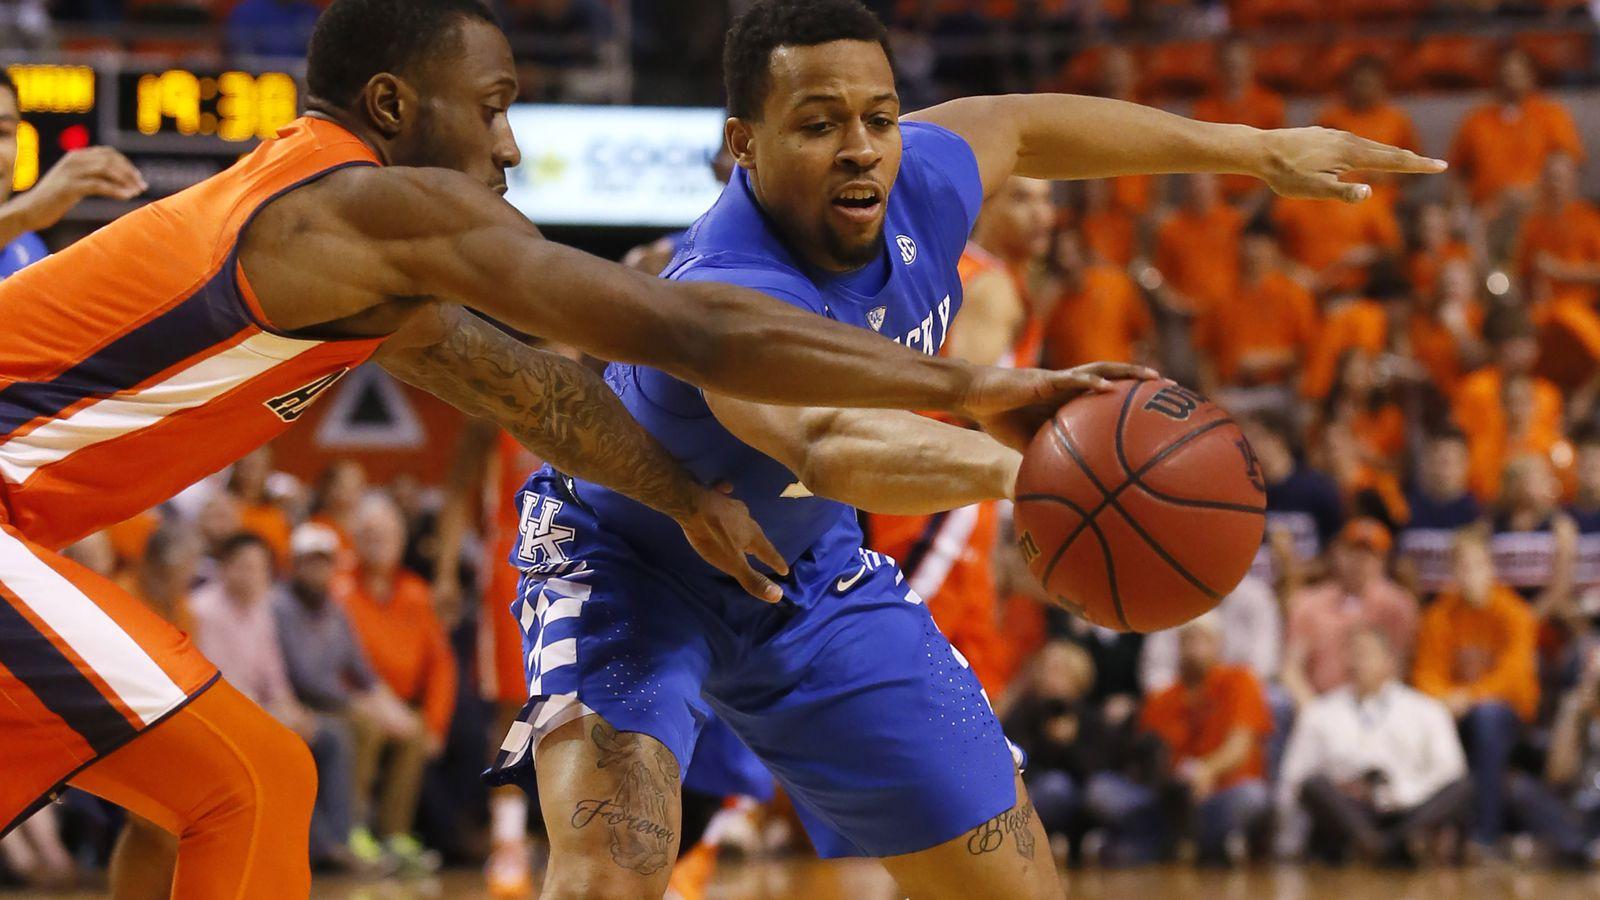 Kentucky Basketball Vs Team Toronto Game Time Tv Channel: Kentucky Wildcats Vs Auburn Tigers: Start Time, TV Info